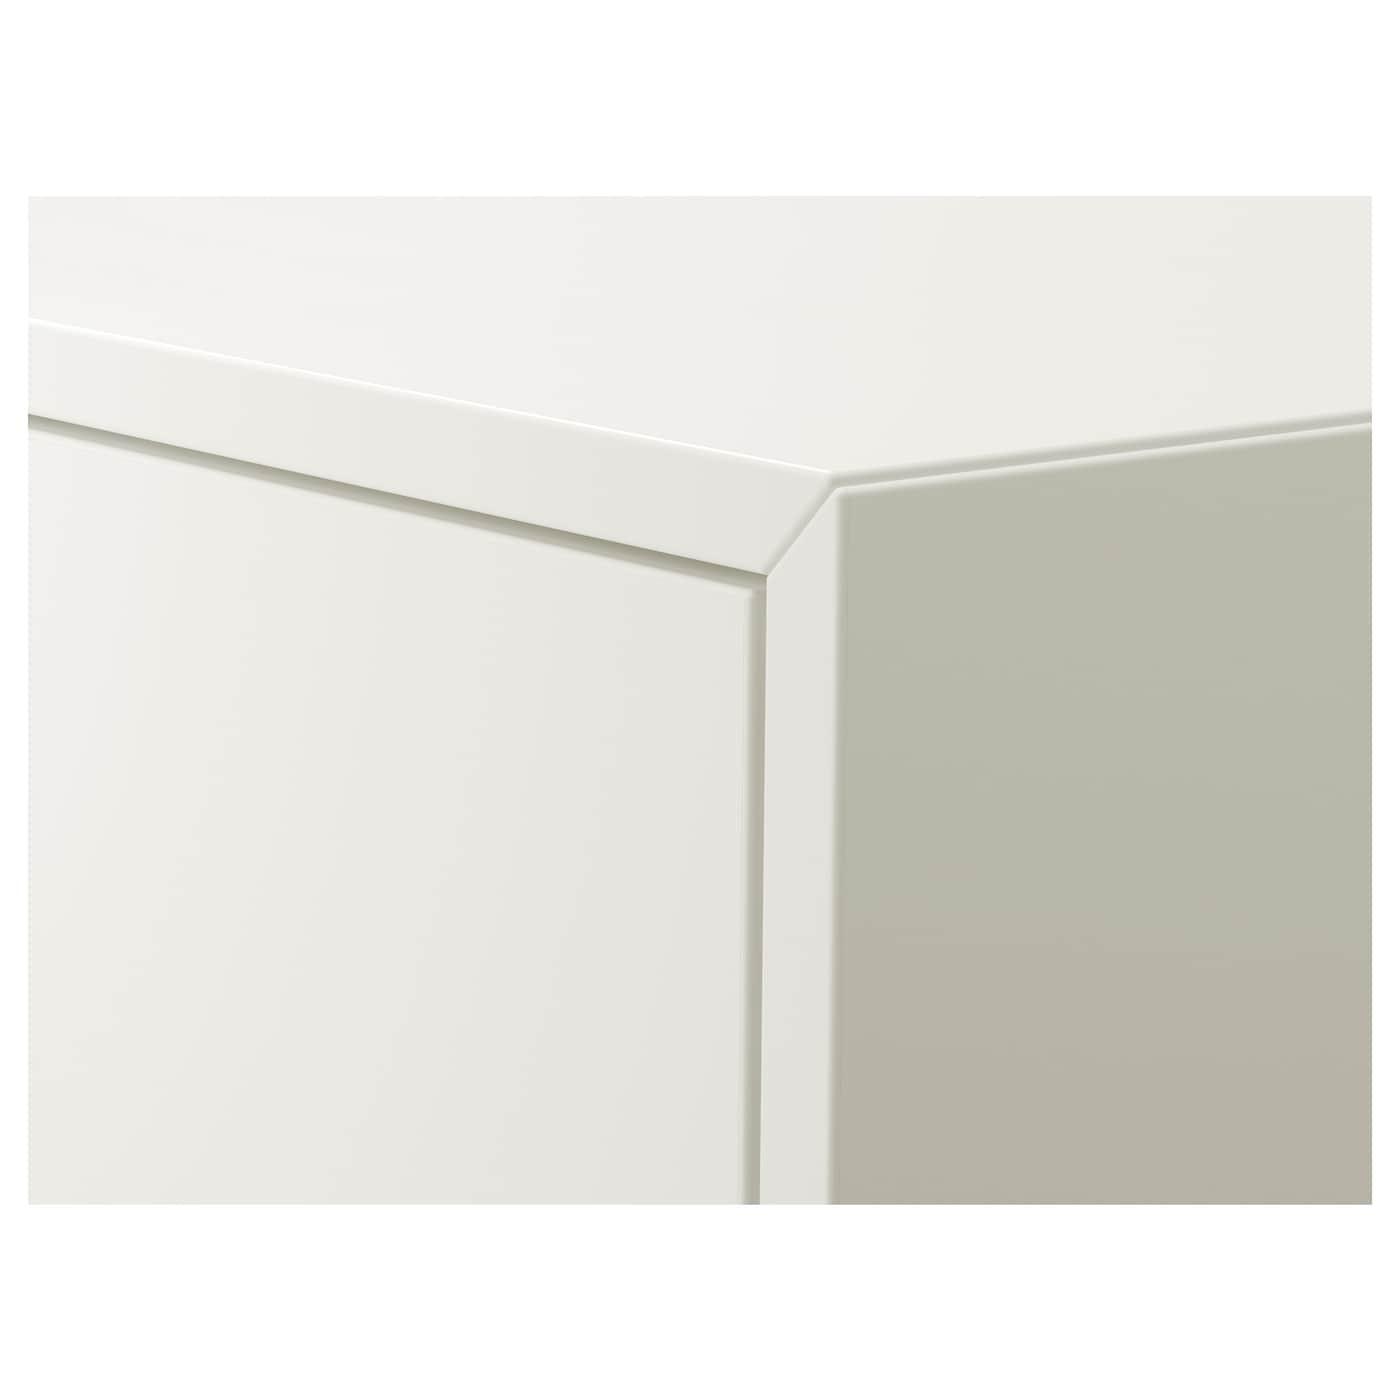 ЕКЕТ шафа з 2 шухлядами білий 35 см 35 см 35 см 26 см 27 см 1.50 кг